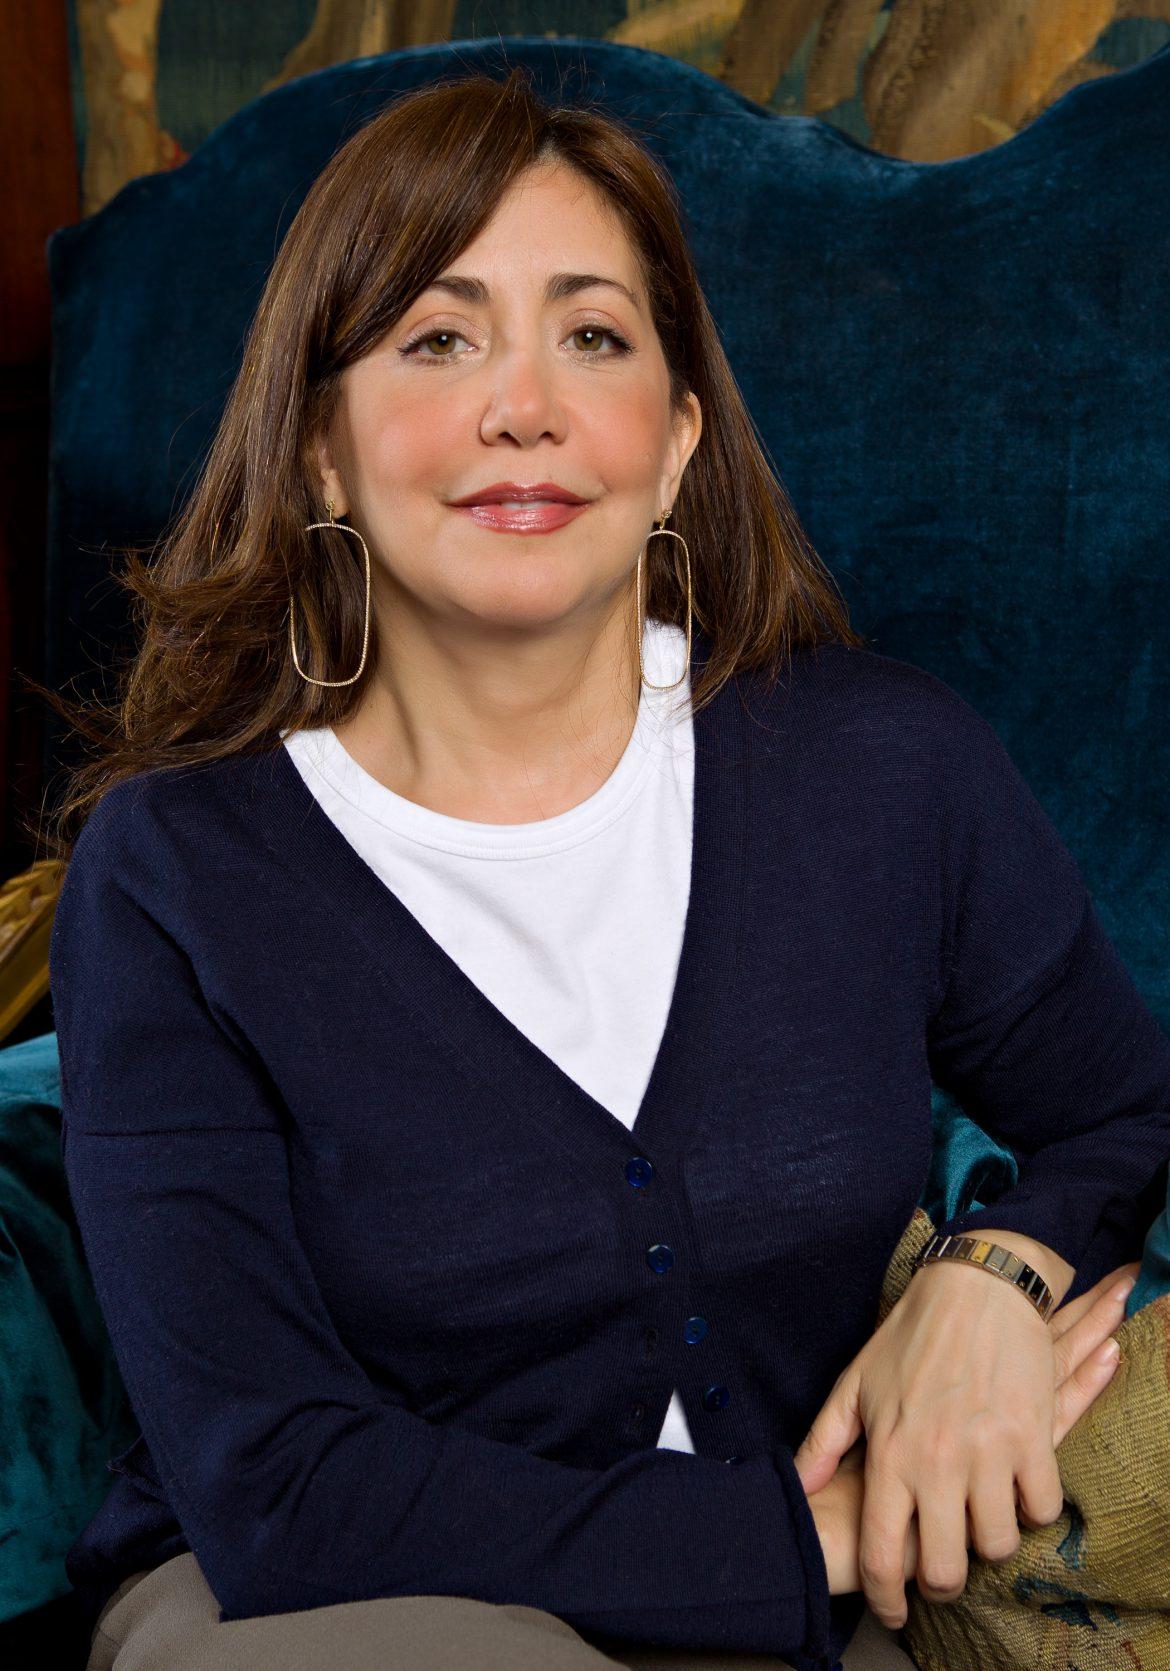 Mona Hajj mona hajj Mona Hajj: 20 years of stunning interiors! QZQPSLCC5FF7NMVU3IX4WOJTDY